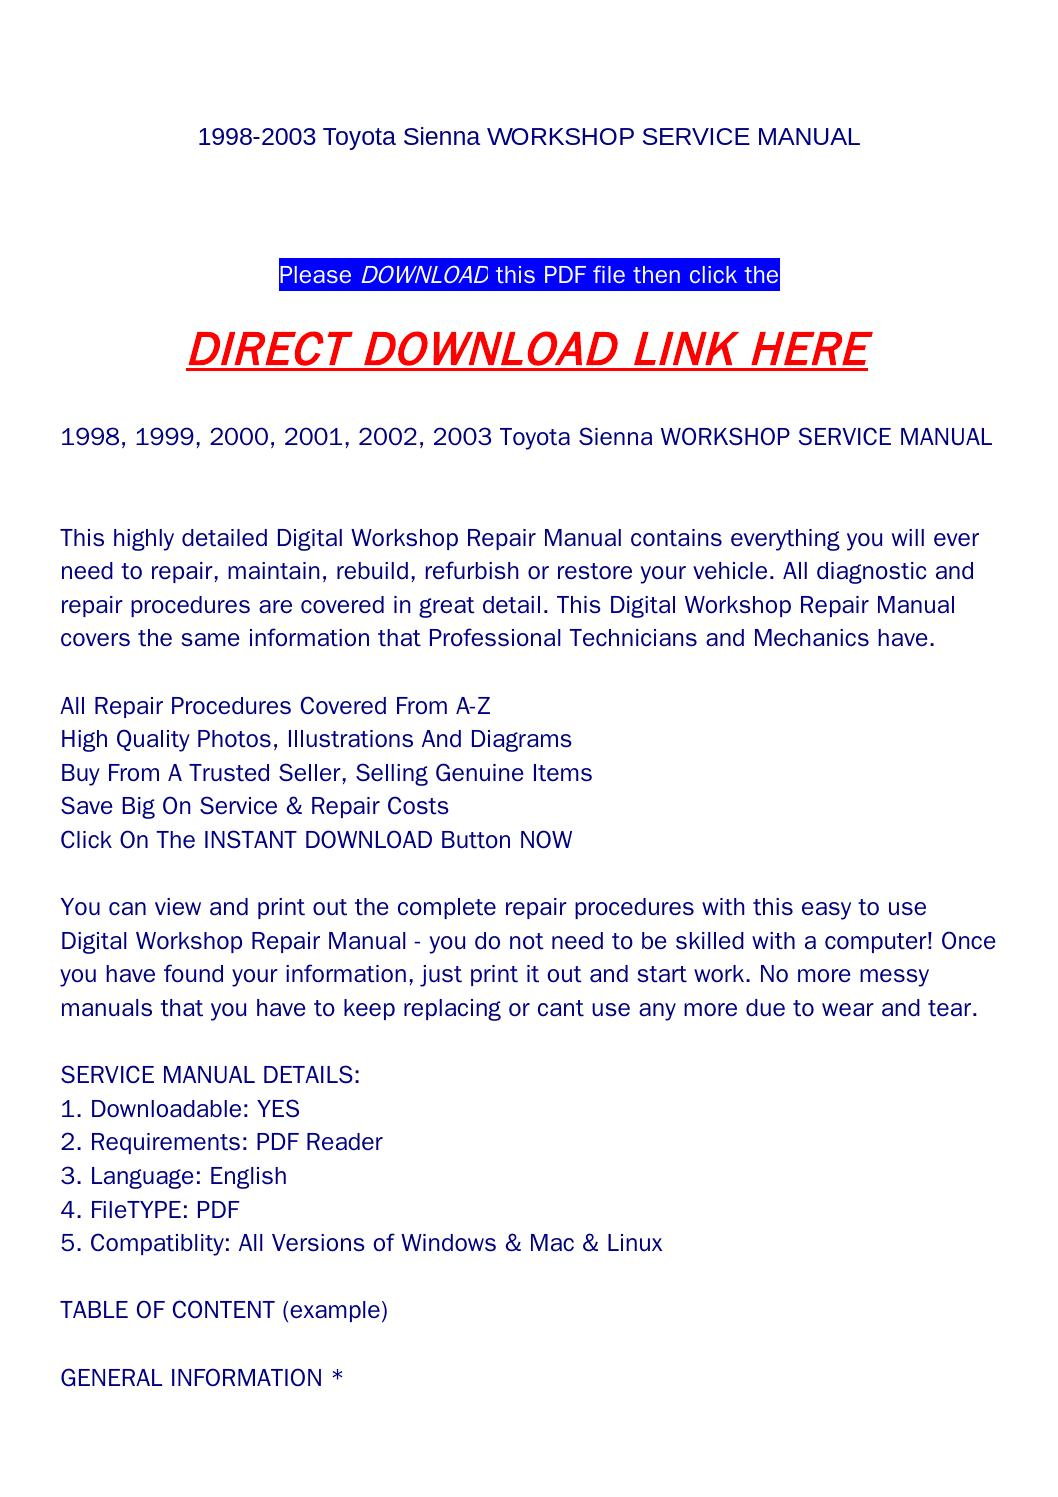 Toyota Sienna Service Manual: Back door outside garnish